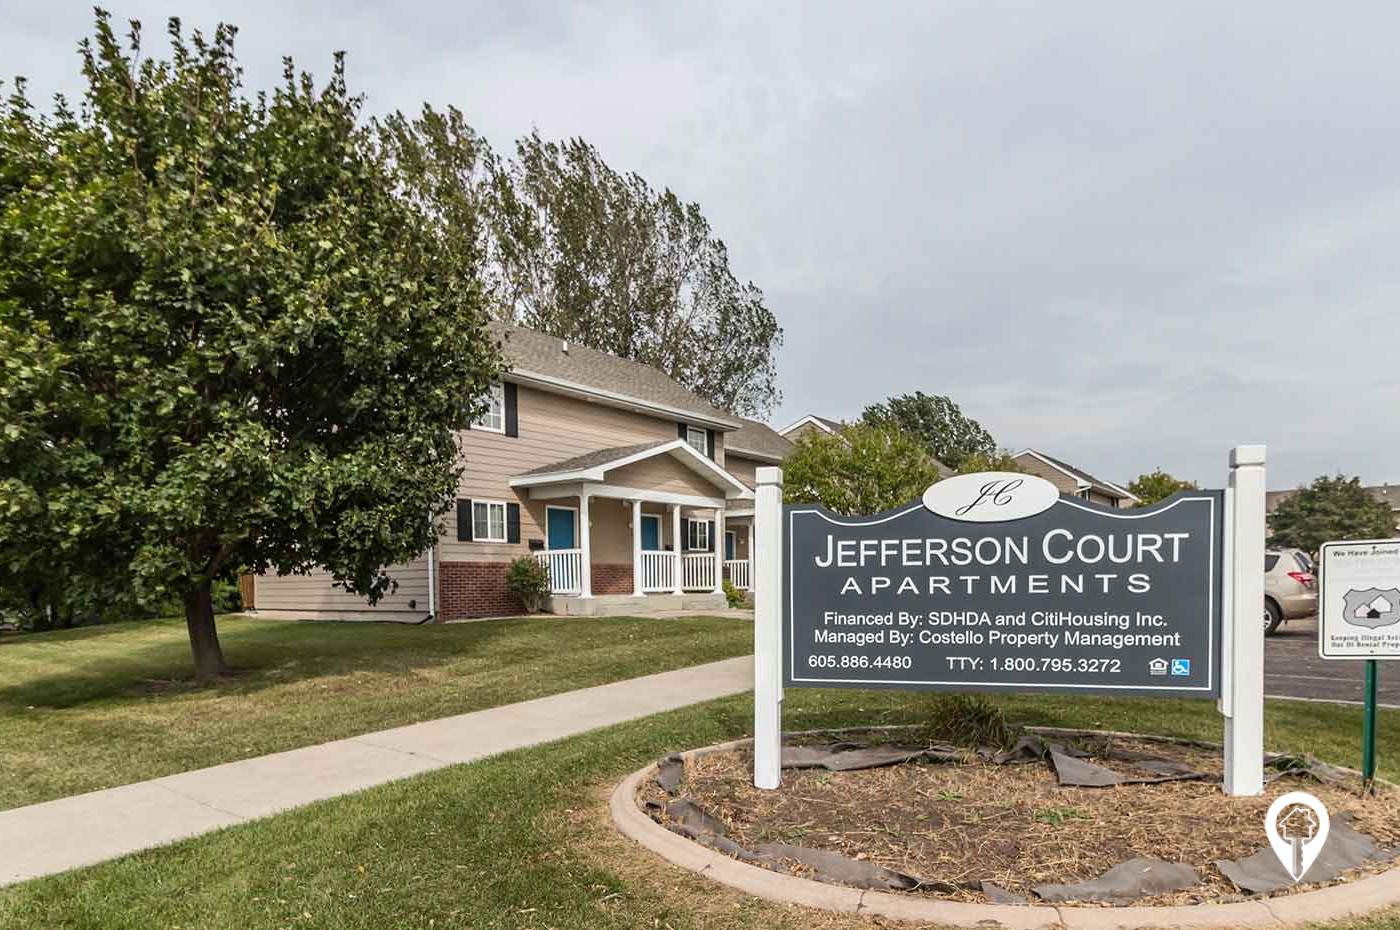 Jefferson Court Townhomes